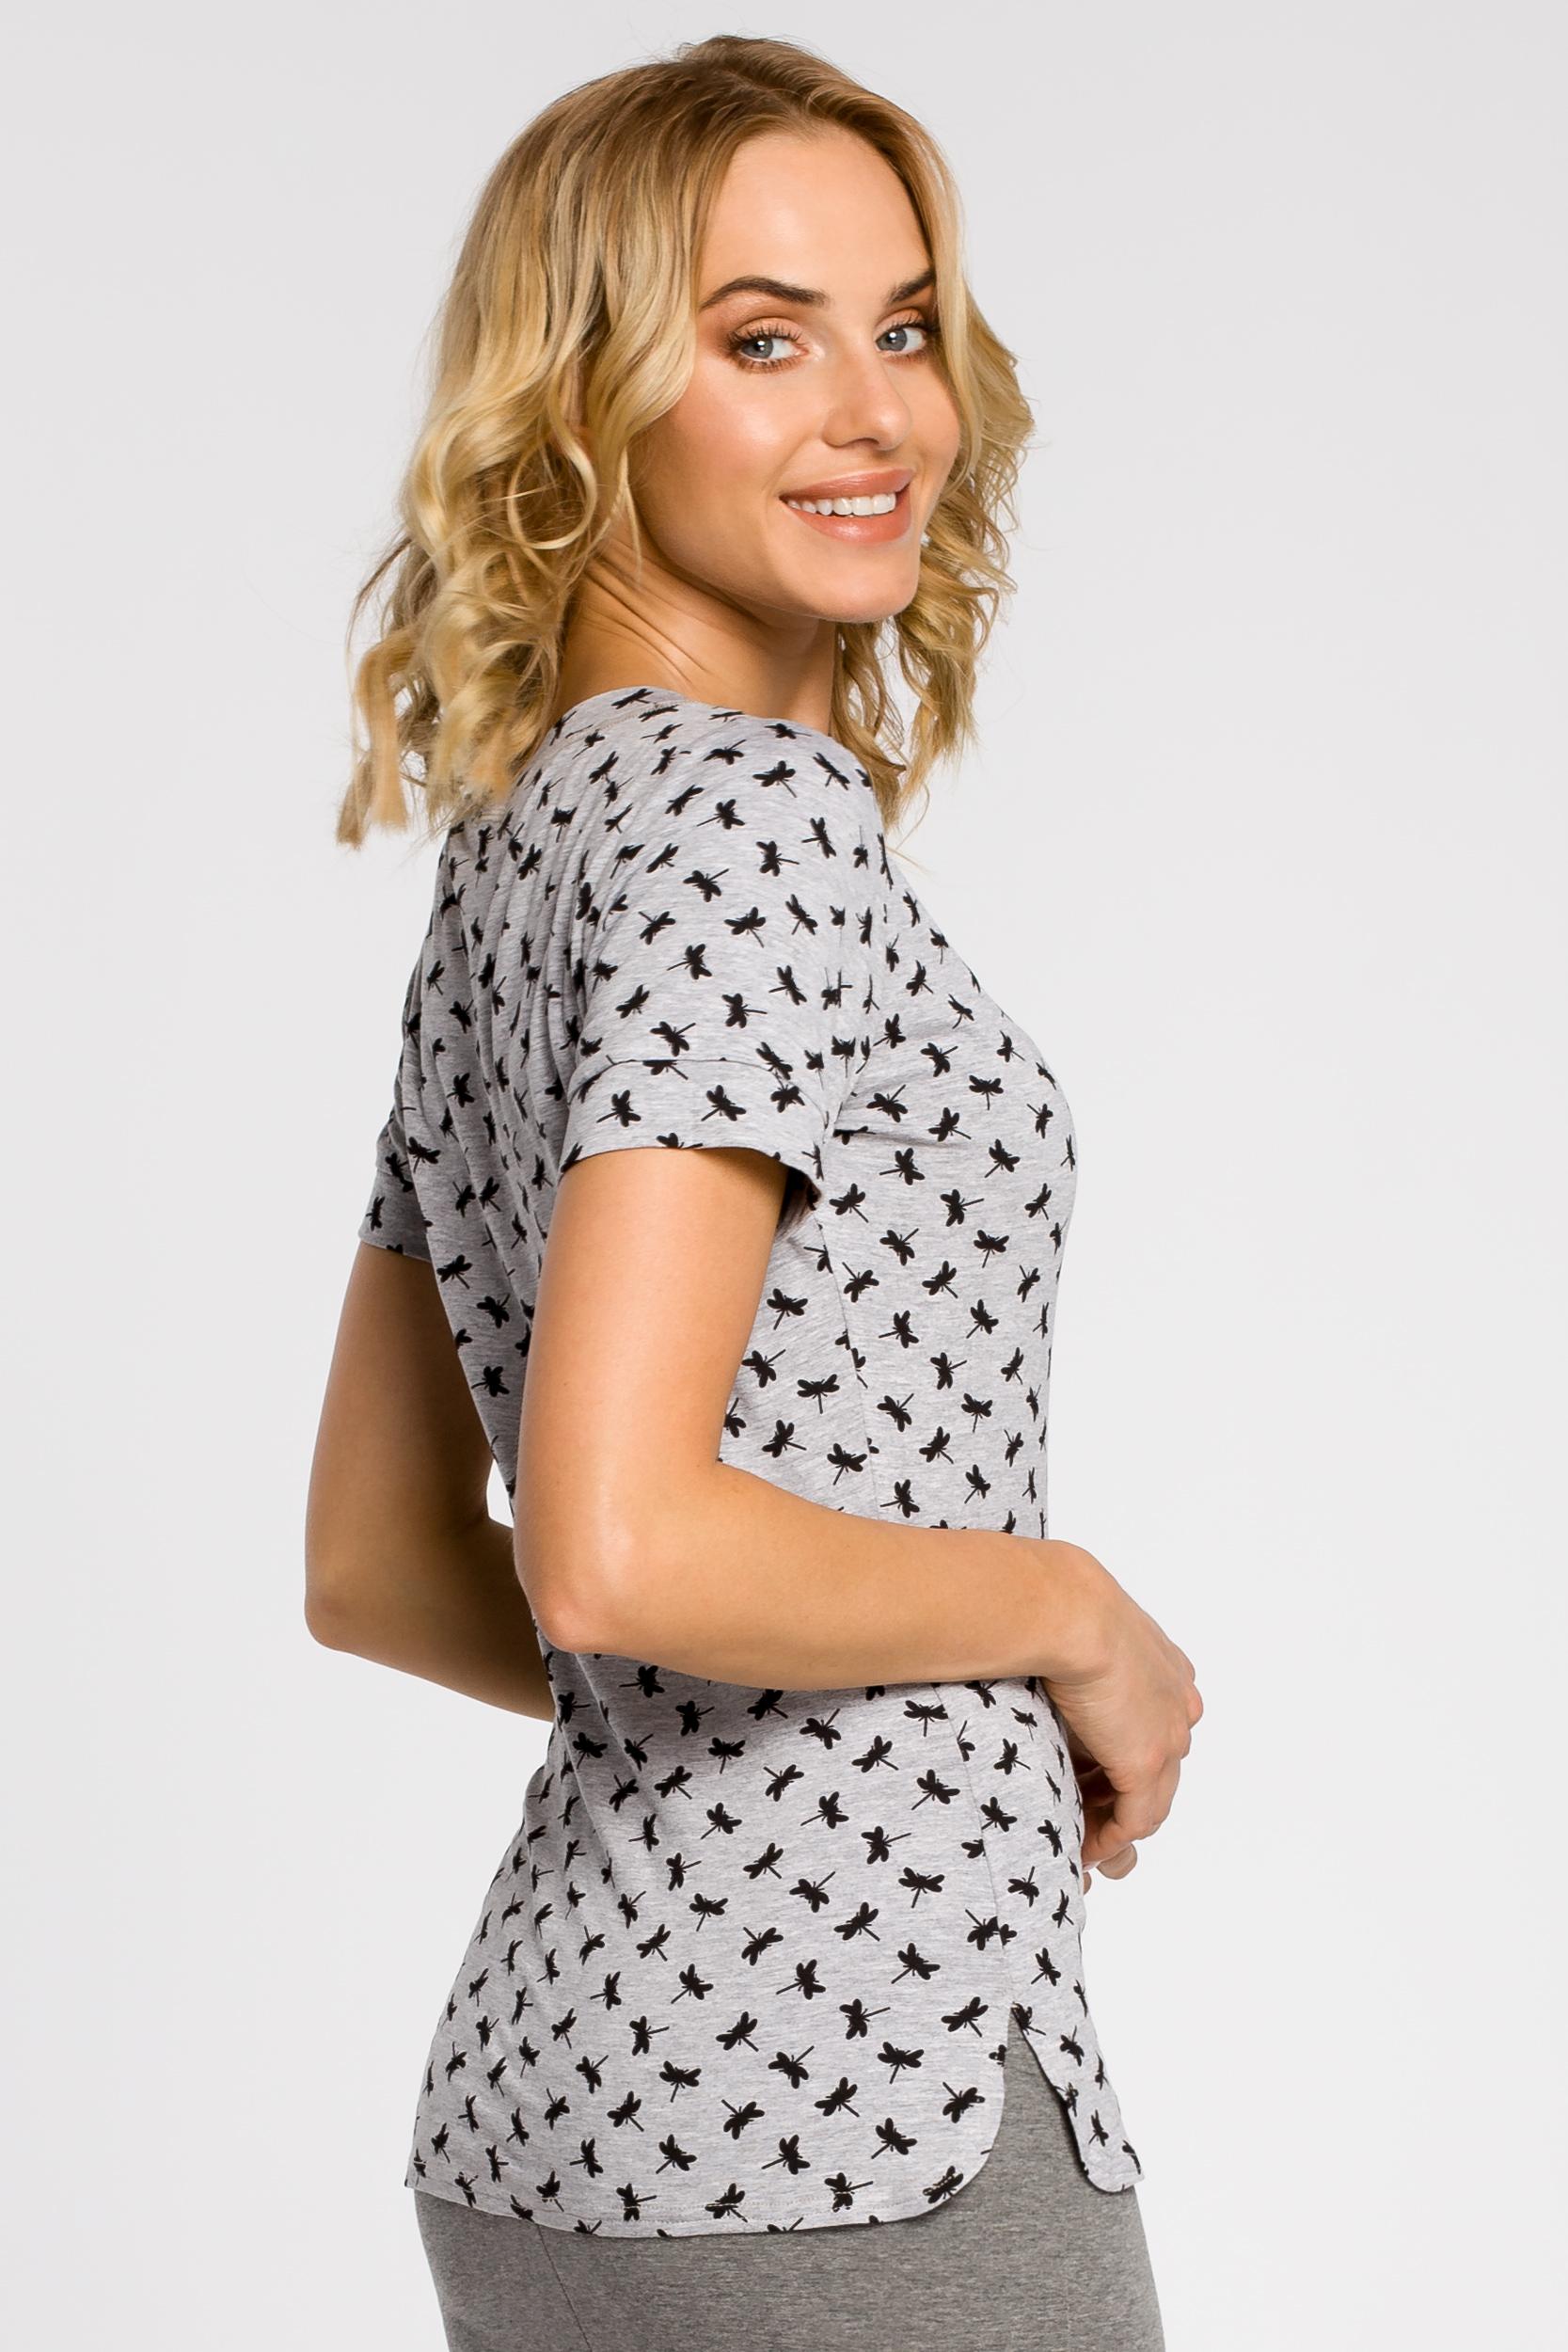 CM1558 Klasyczna koszulka damska z krótkim rękawem - model 2